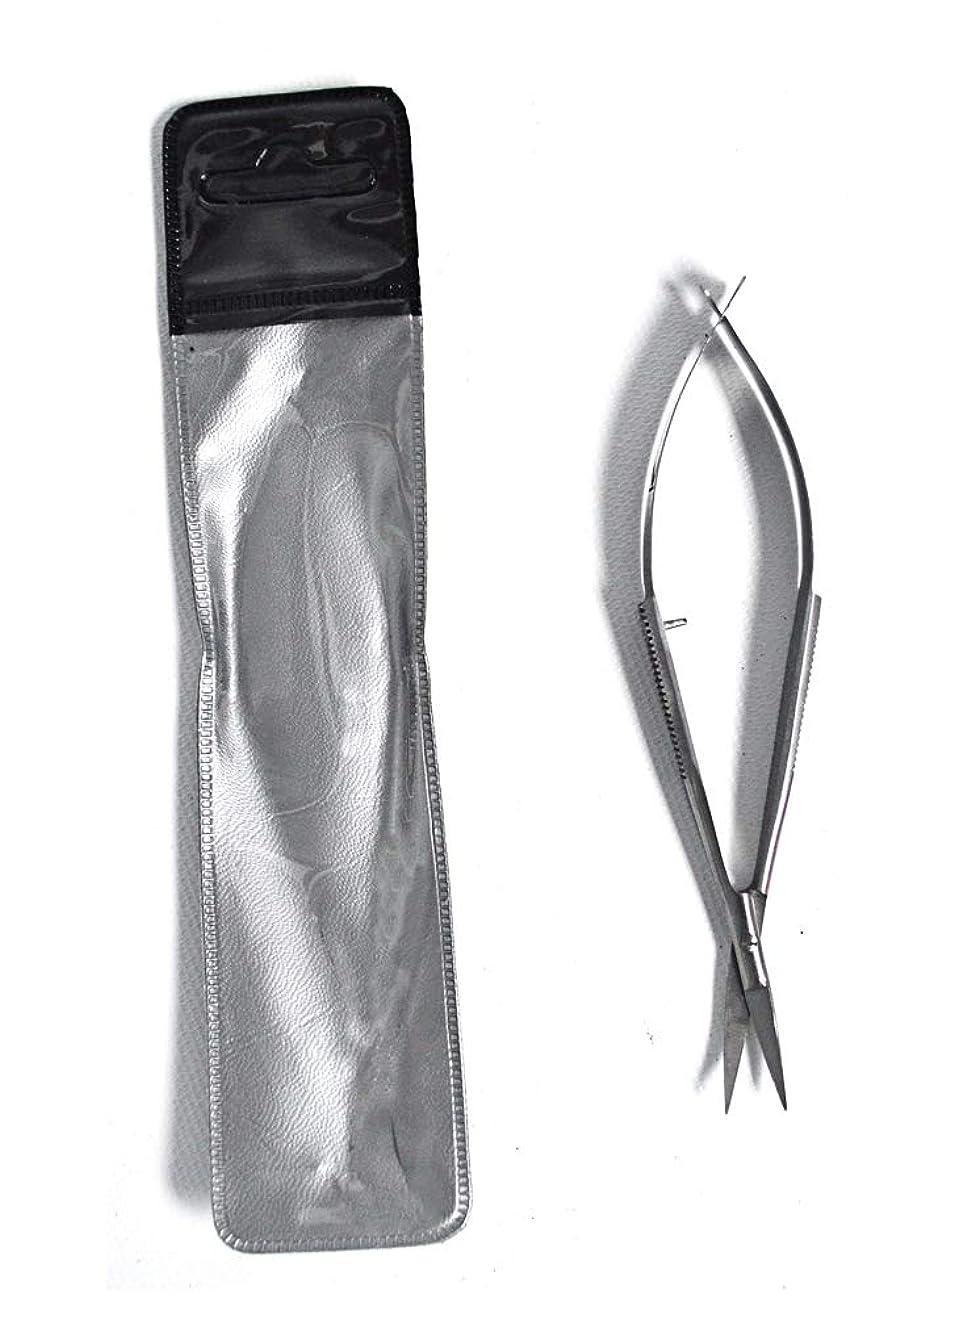 Kretzer Scissors 910309K Curved Stainless Steel 4-1/2in Thread Snips None